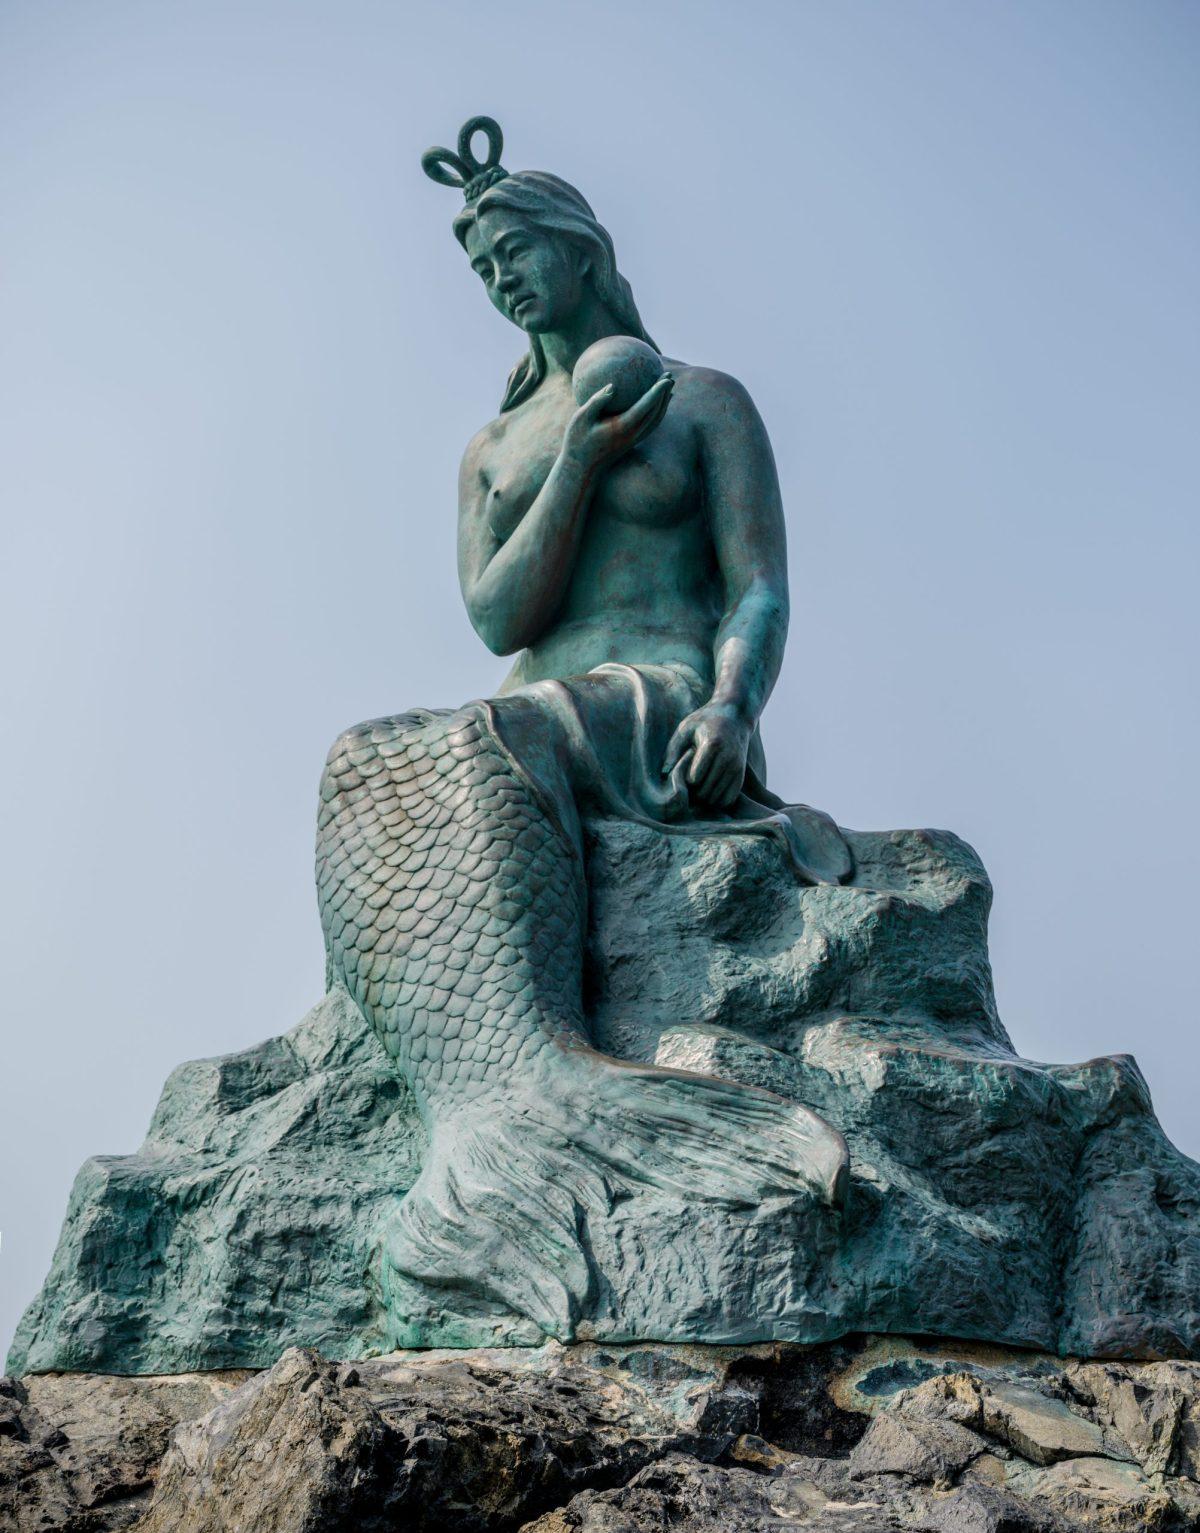 The Princess Hwangok Mermaid of Doengbaek